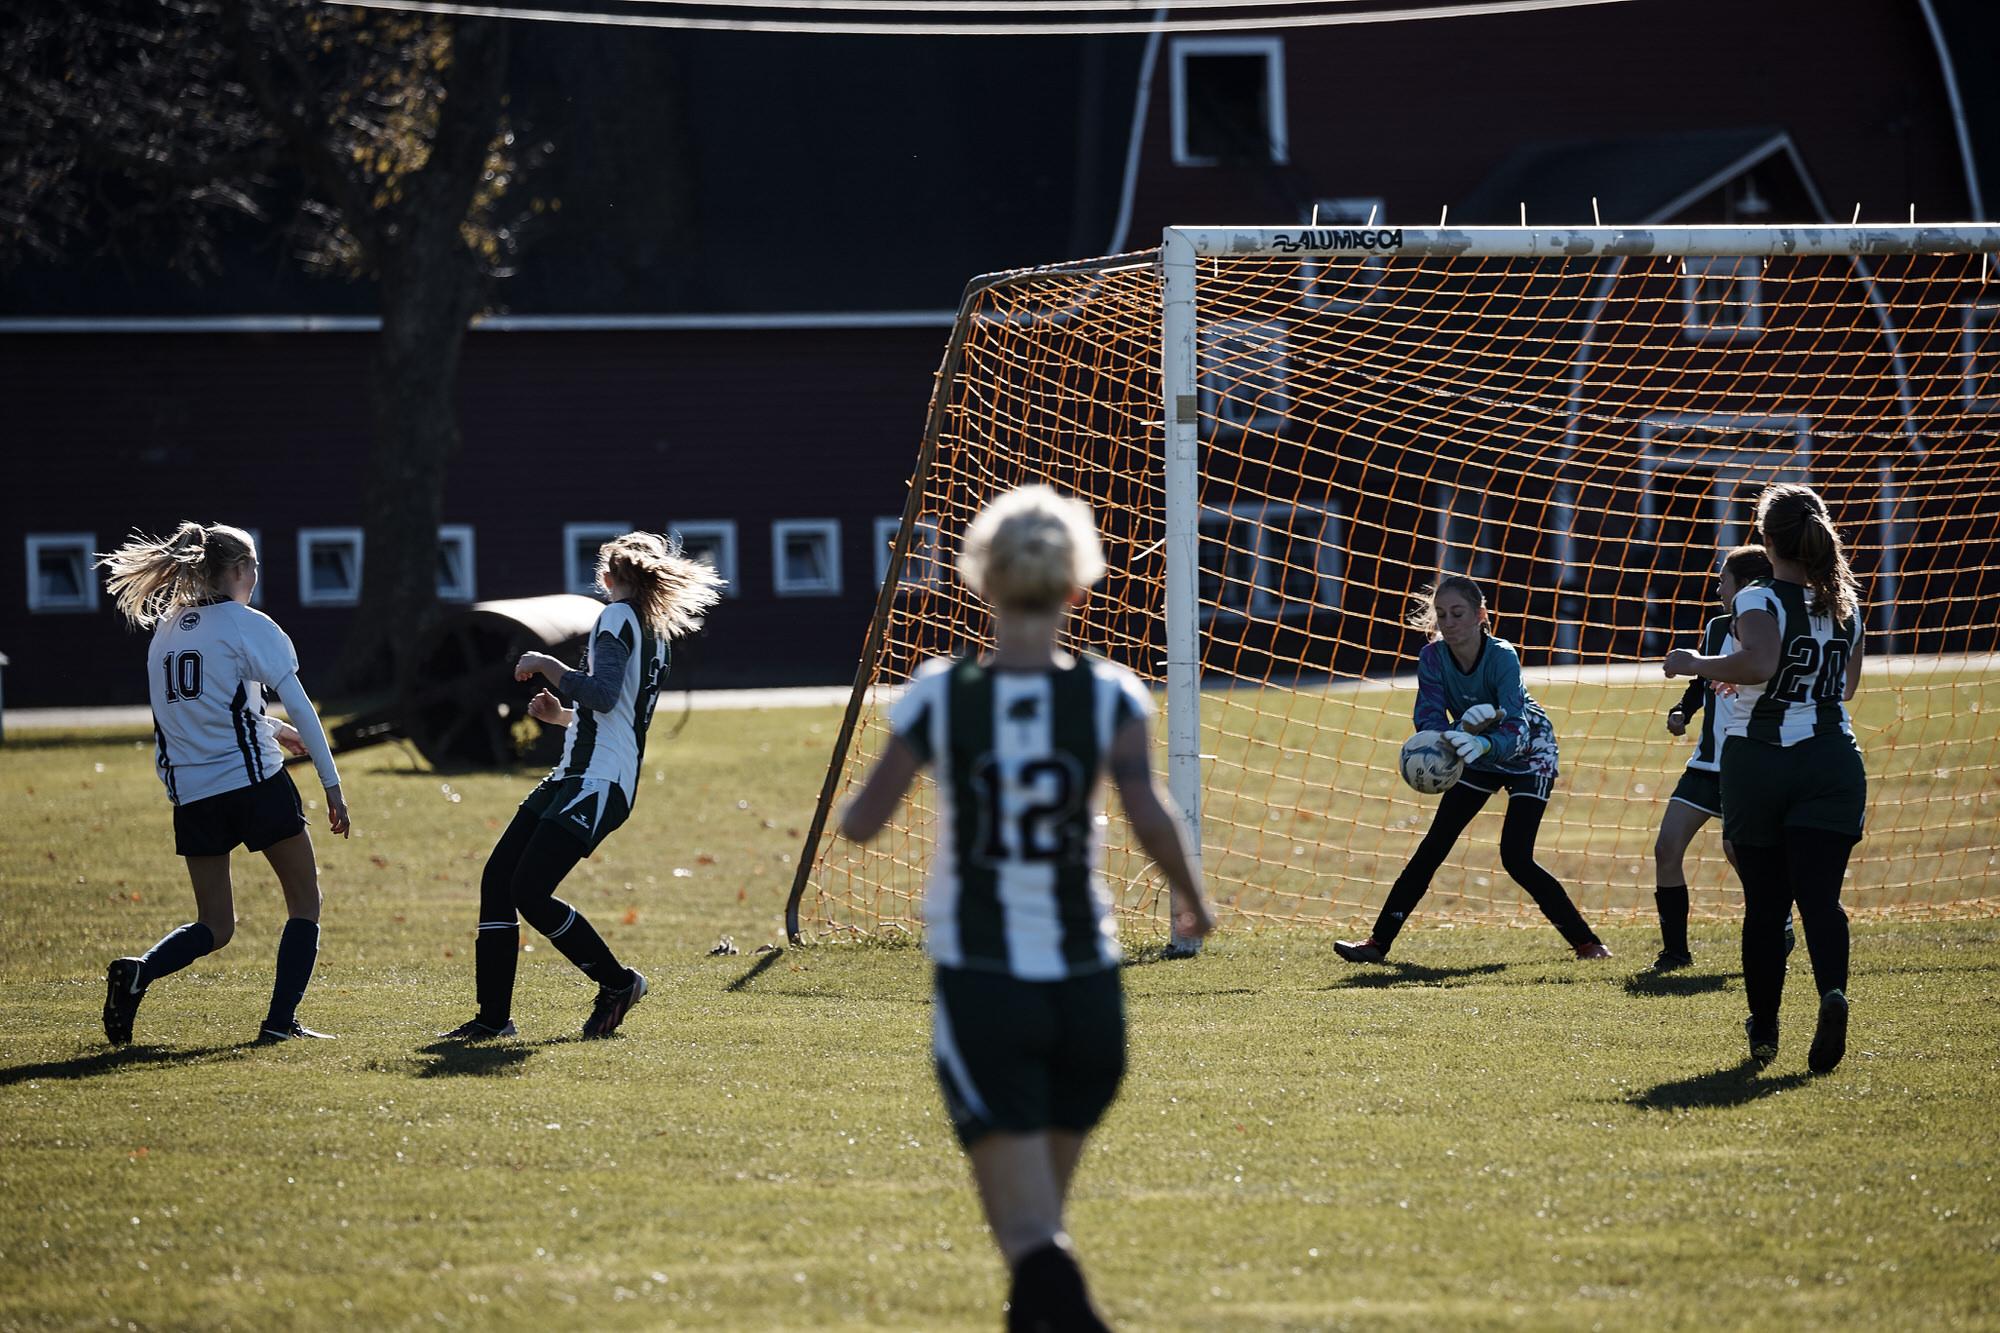 Girls Varsity Soccer vs. Putney School - October 26, 2018 - 007.jpg